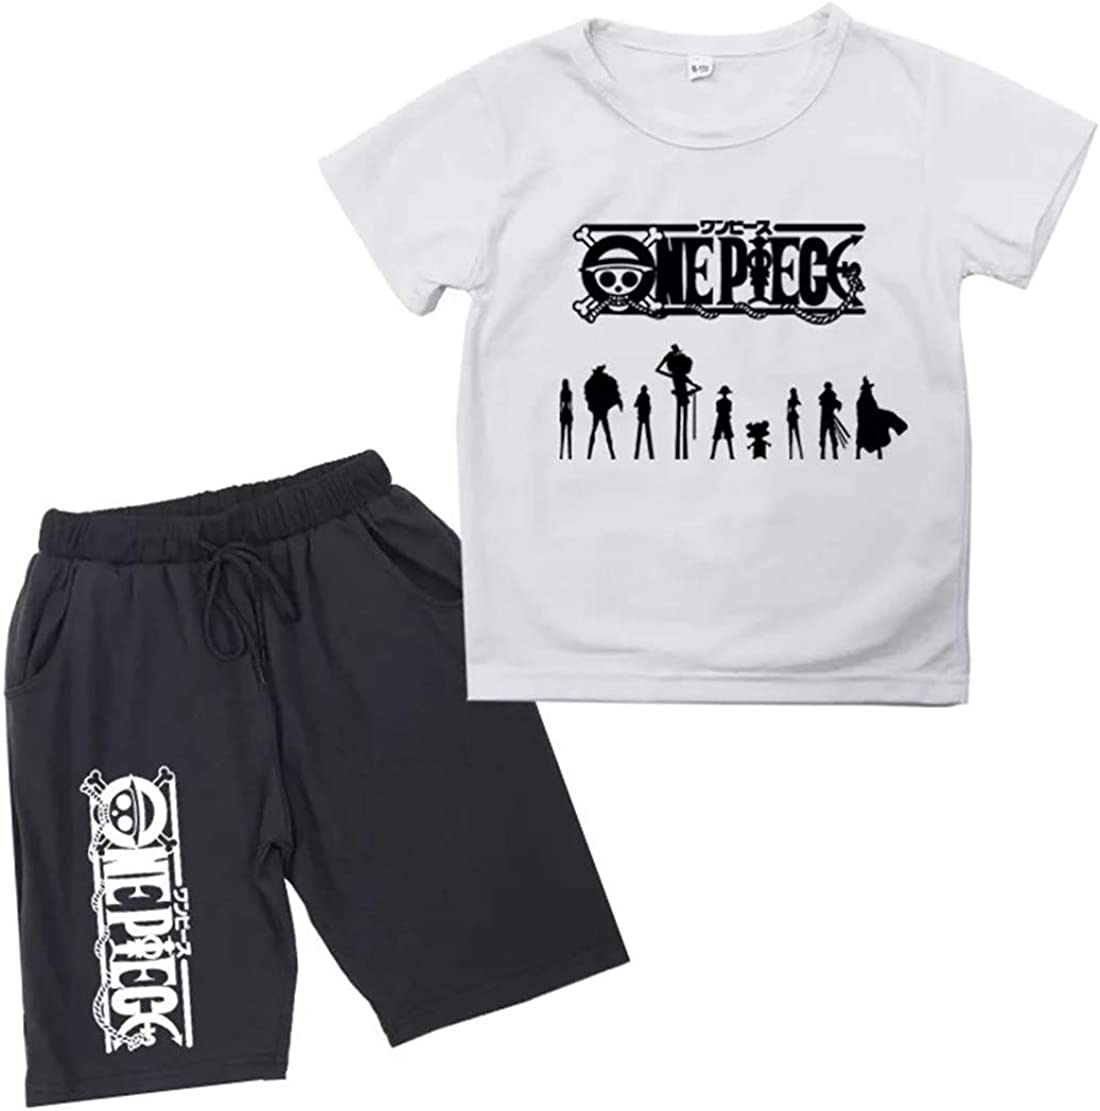 XMTIHE Kids Child One Piece Short Sleeve Tee Shirt-Crewneck T-Shirt+Shorts Set for Boys Girls